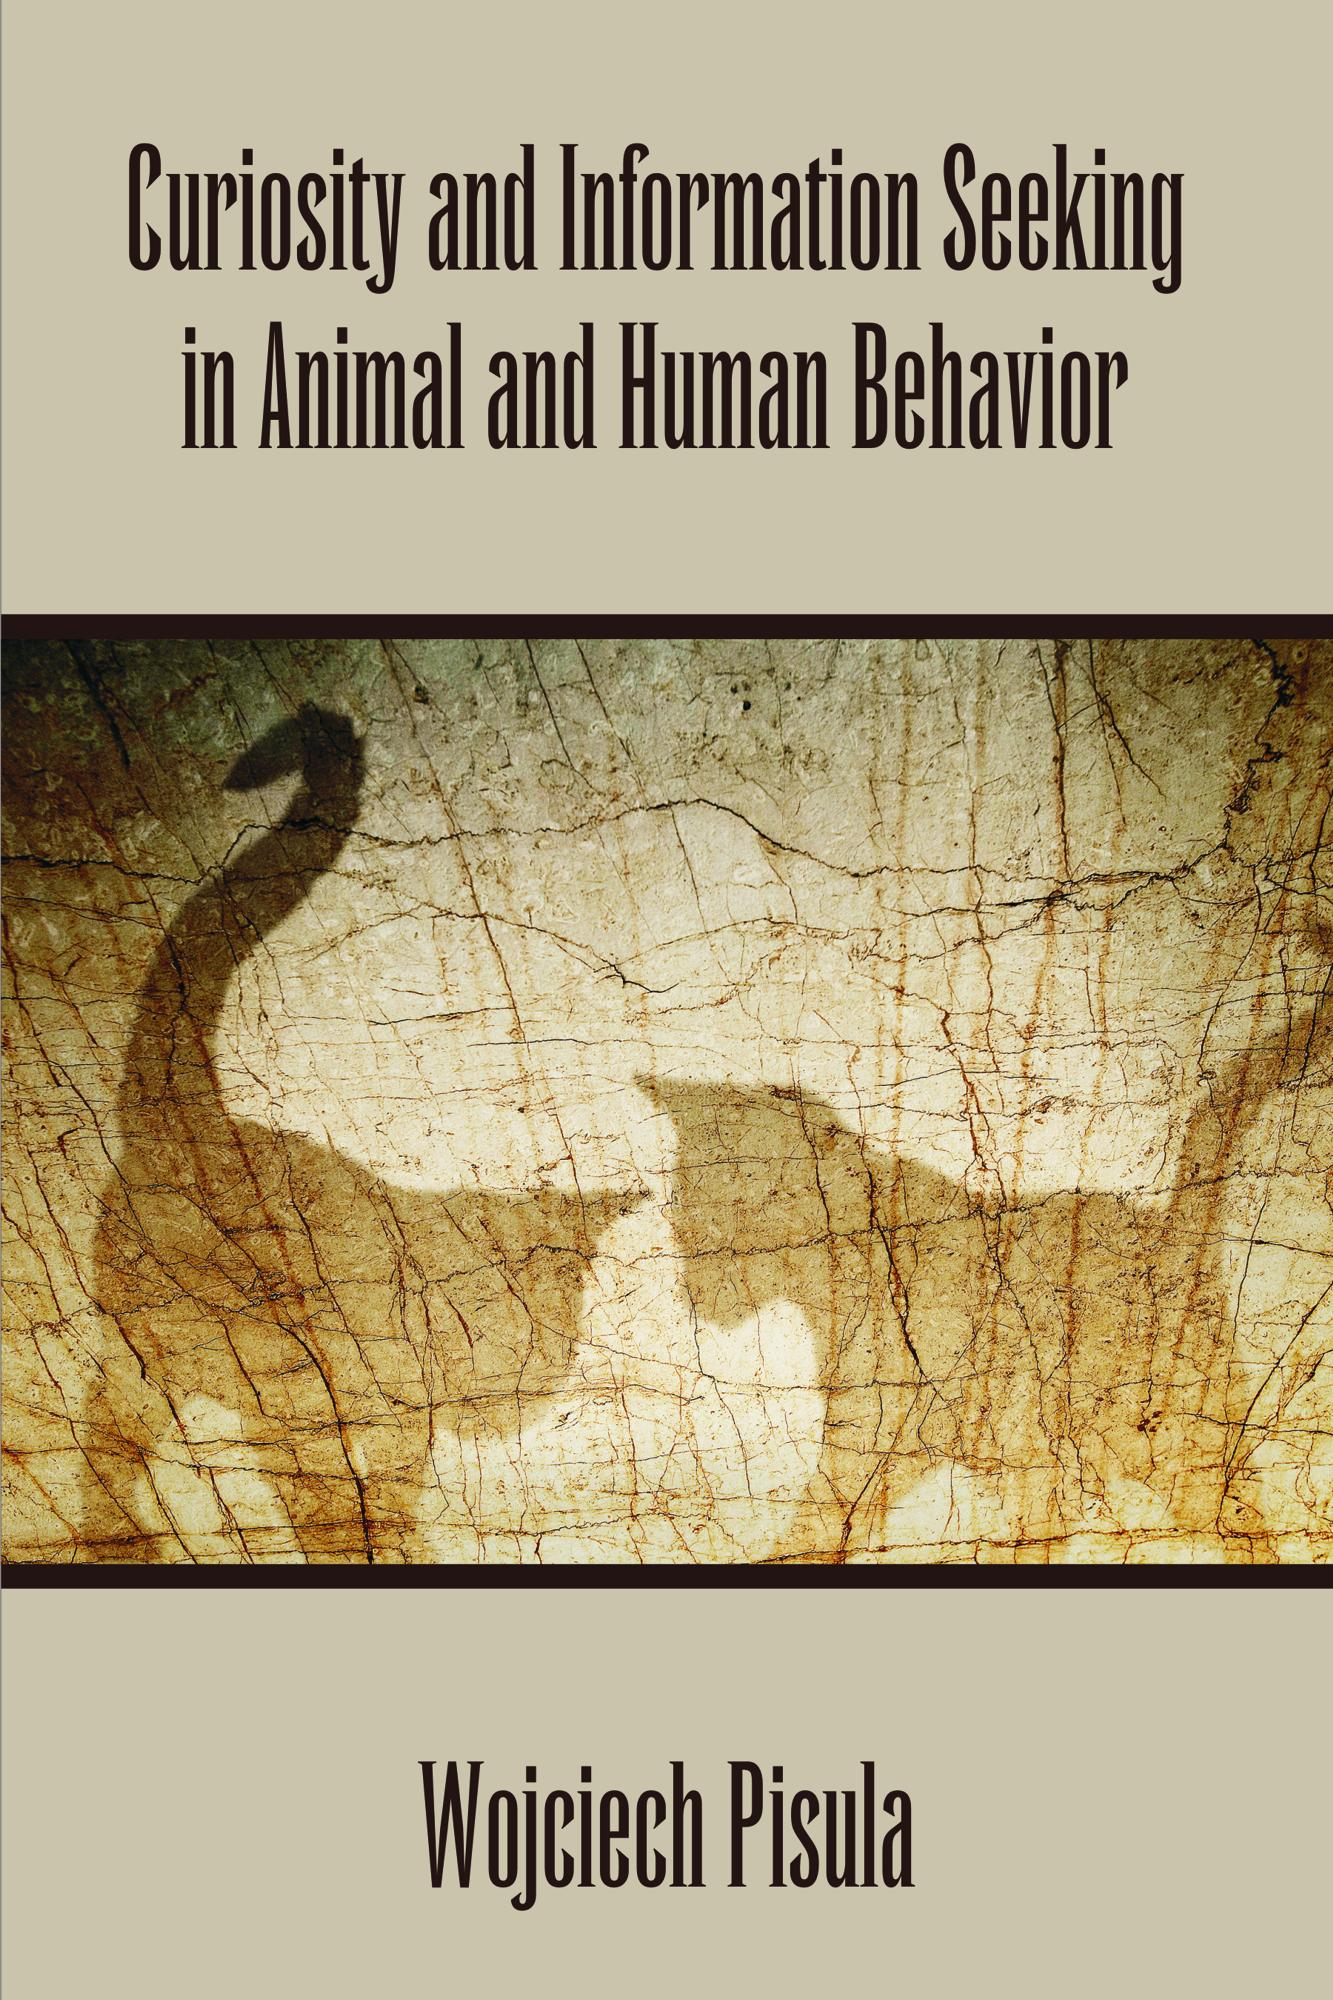 Curiosity and Information Seeking in Animal and Human Behavior EB9781599424996